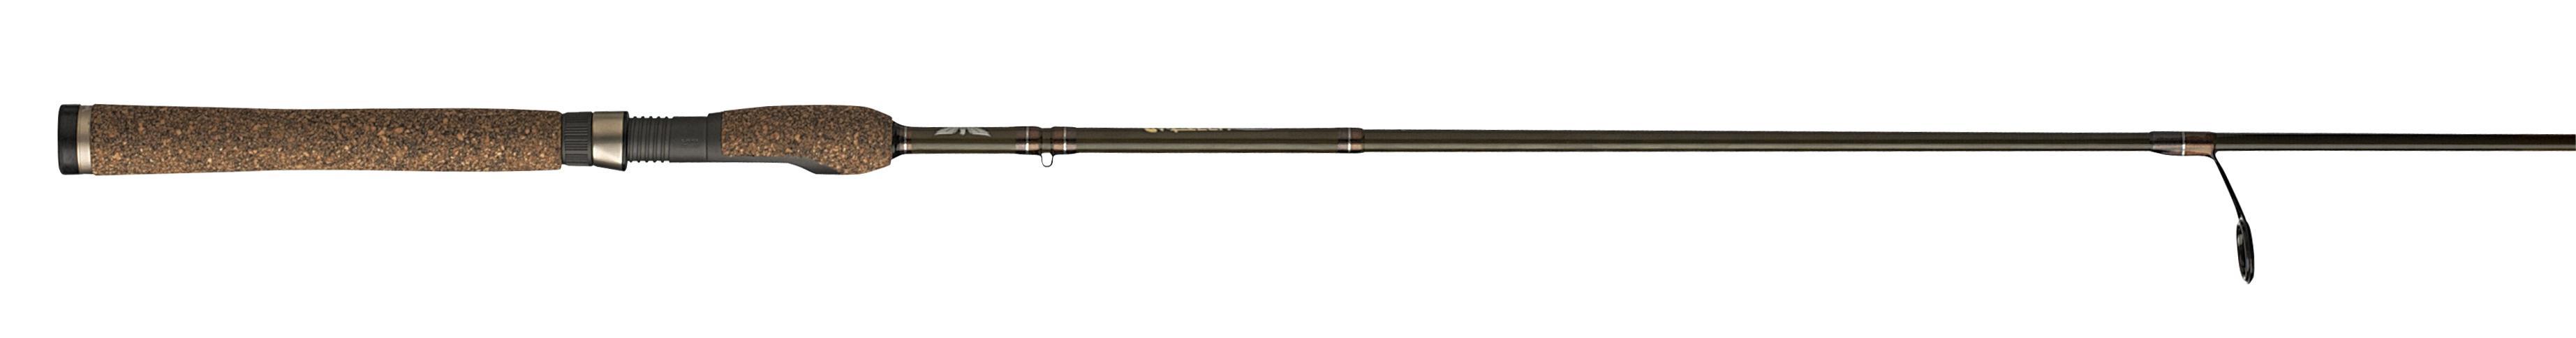 Fenwick Elite Tech Walleye Jigging Fishing Rod - Thumbnail 1